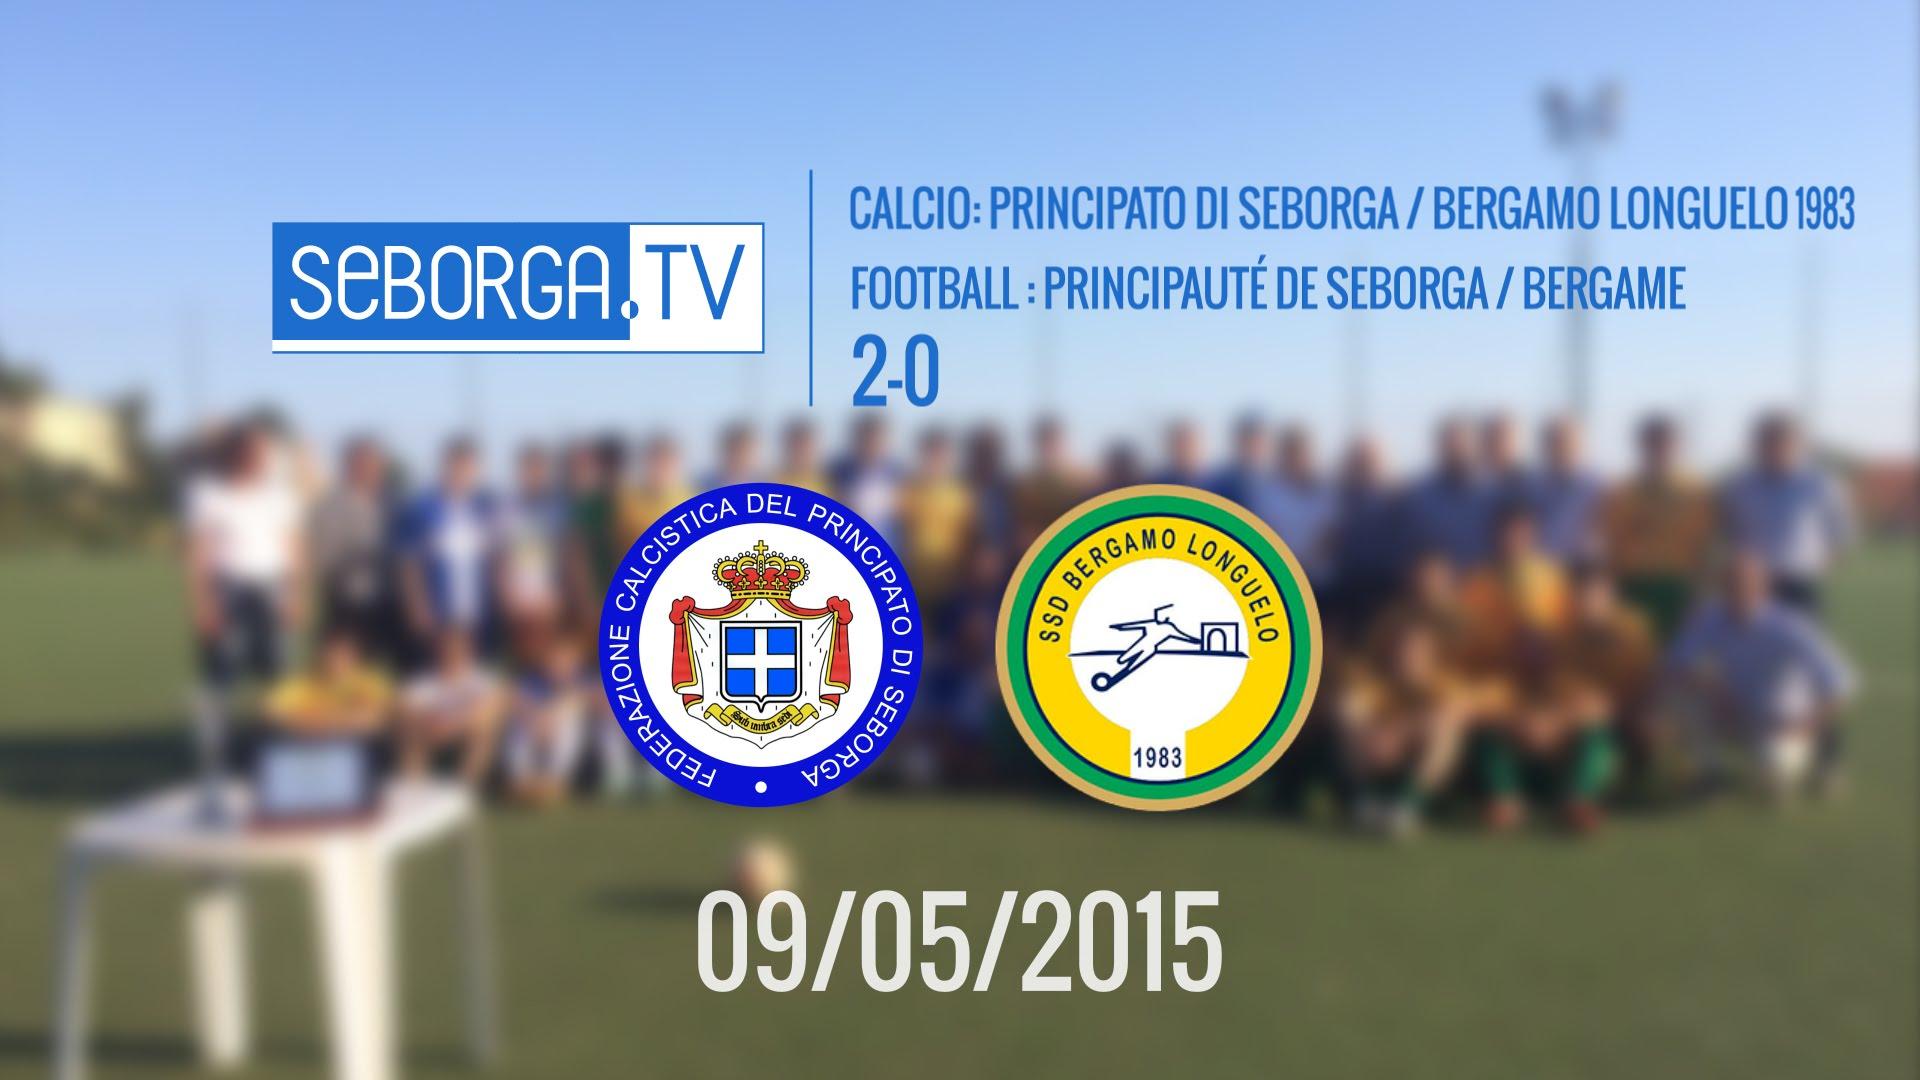 Football : Seborga – Bergamo Longuelo 1983 (2-0) (09/05/2015)